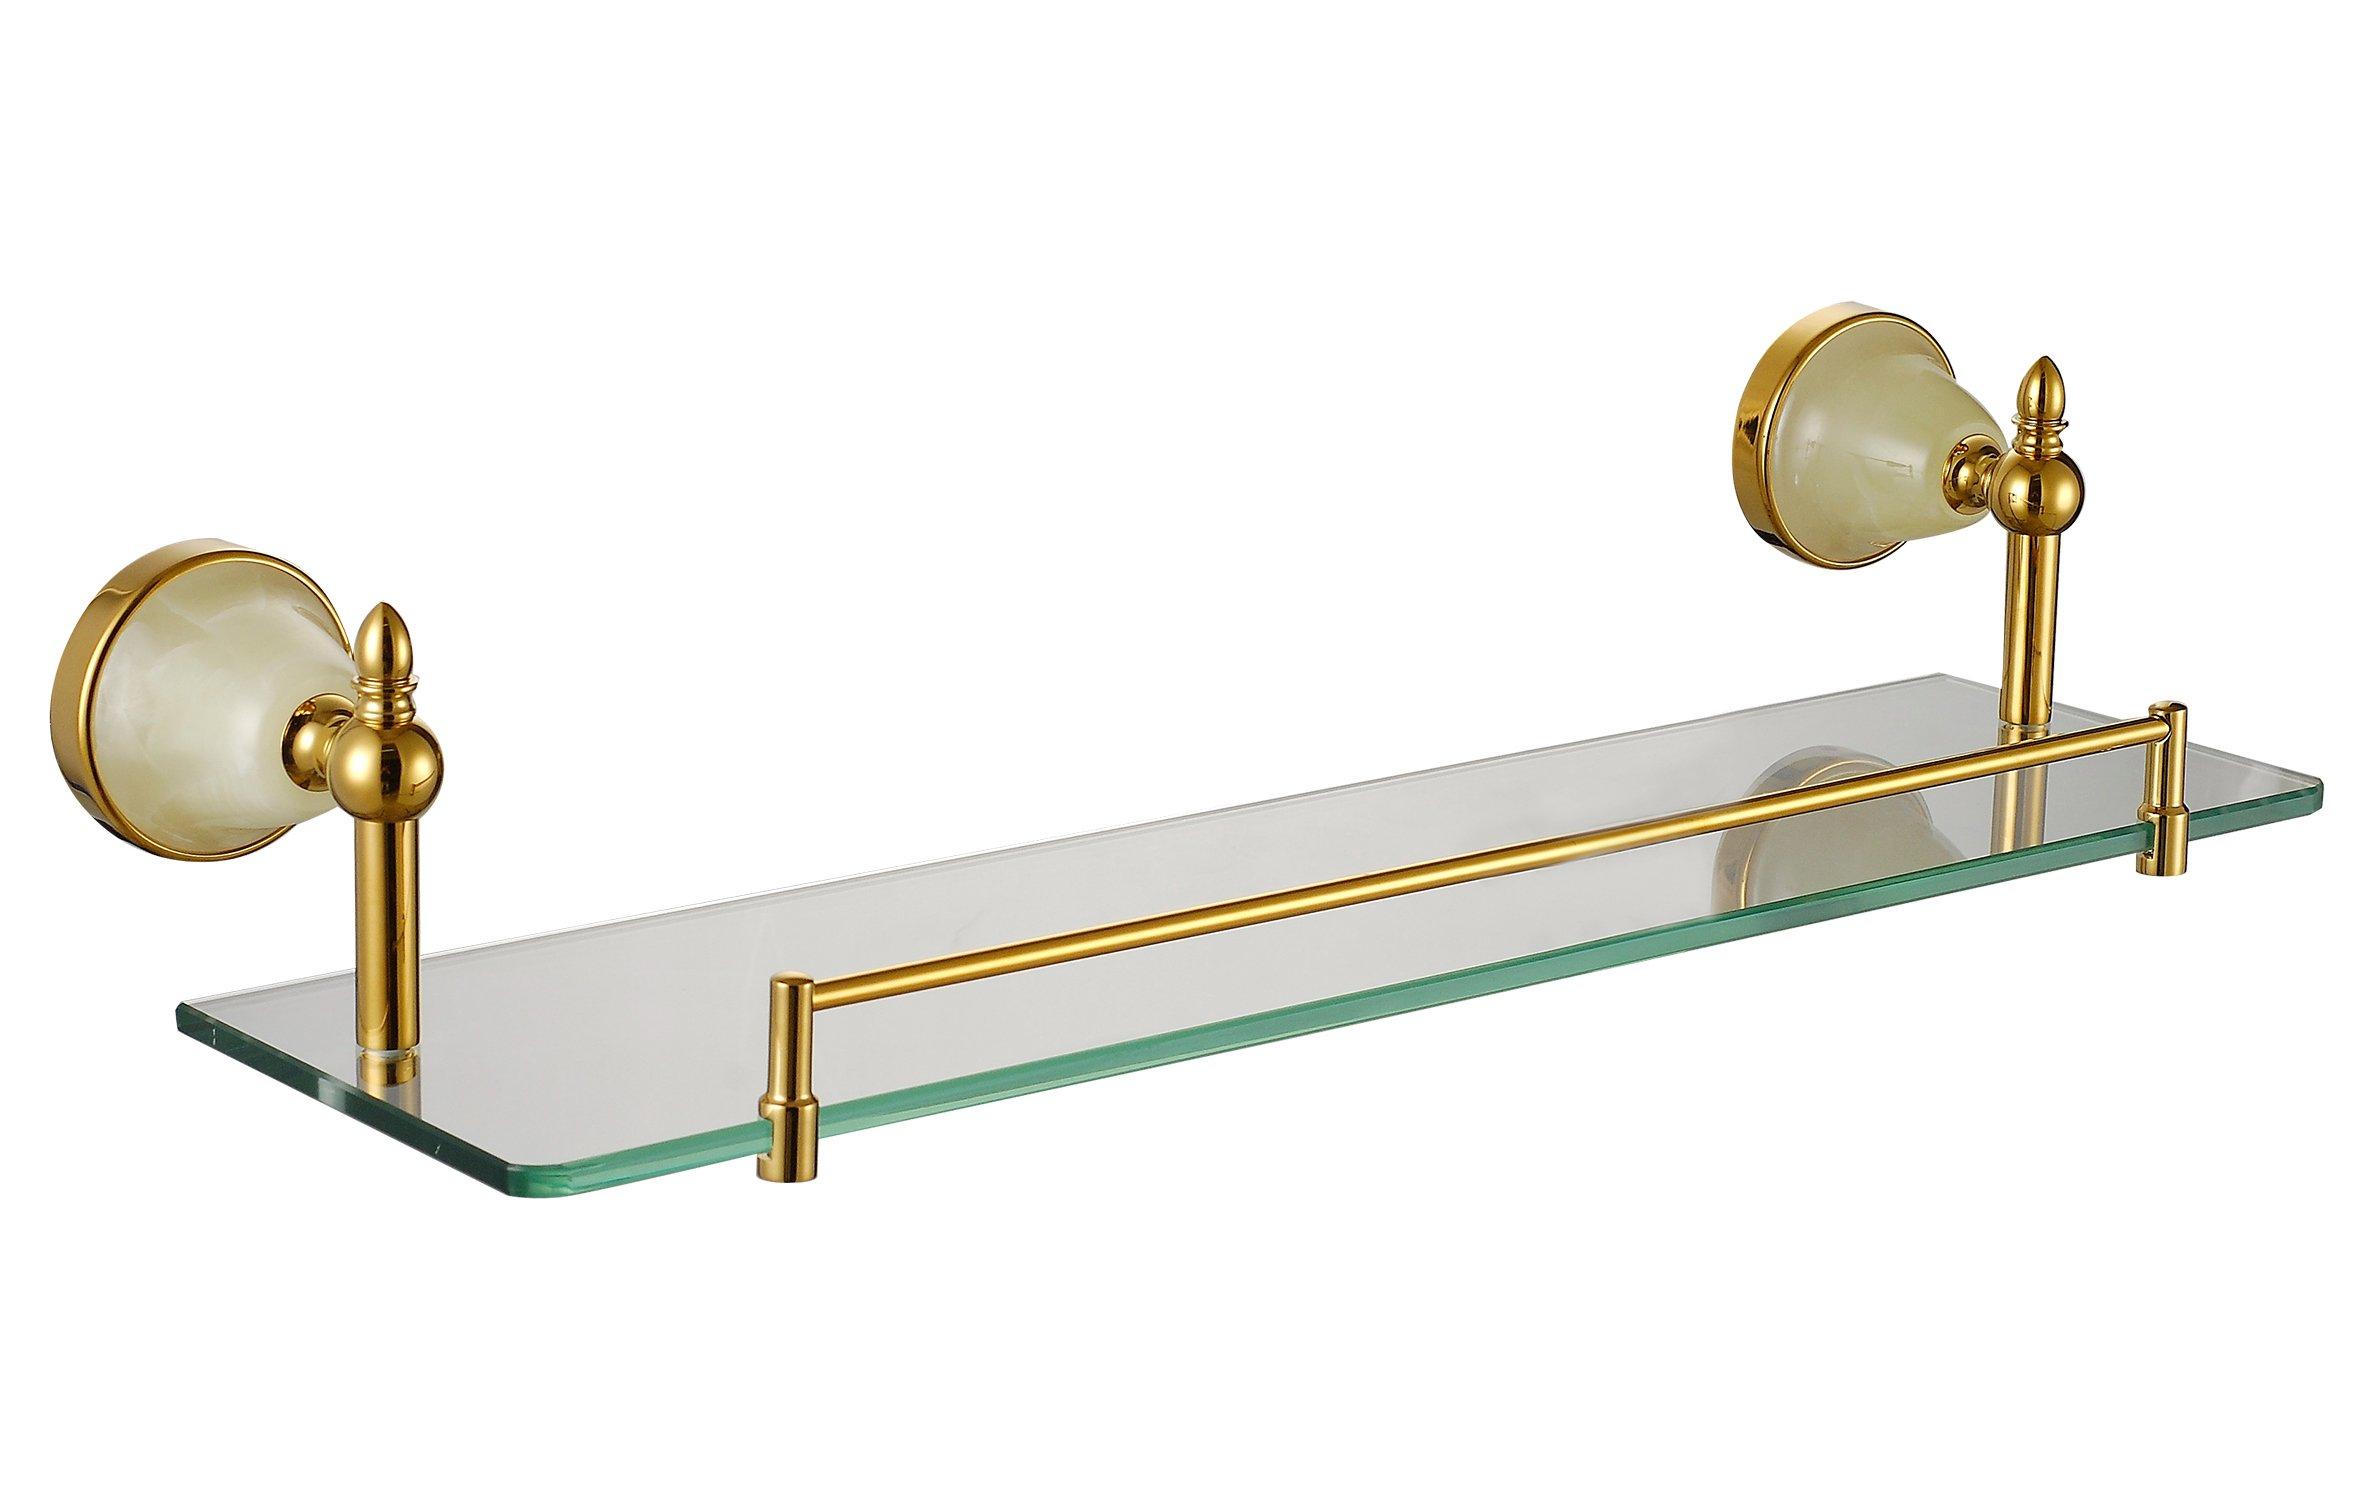 Cloud Power Bathroom Brass Single Glass Shelves Single Glass Shelves Titanium Wall-mounted Single Glass Shelves With Jade Decorated